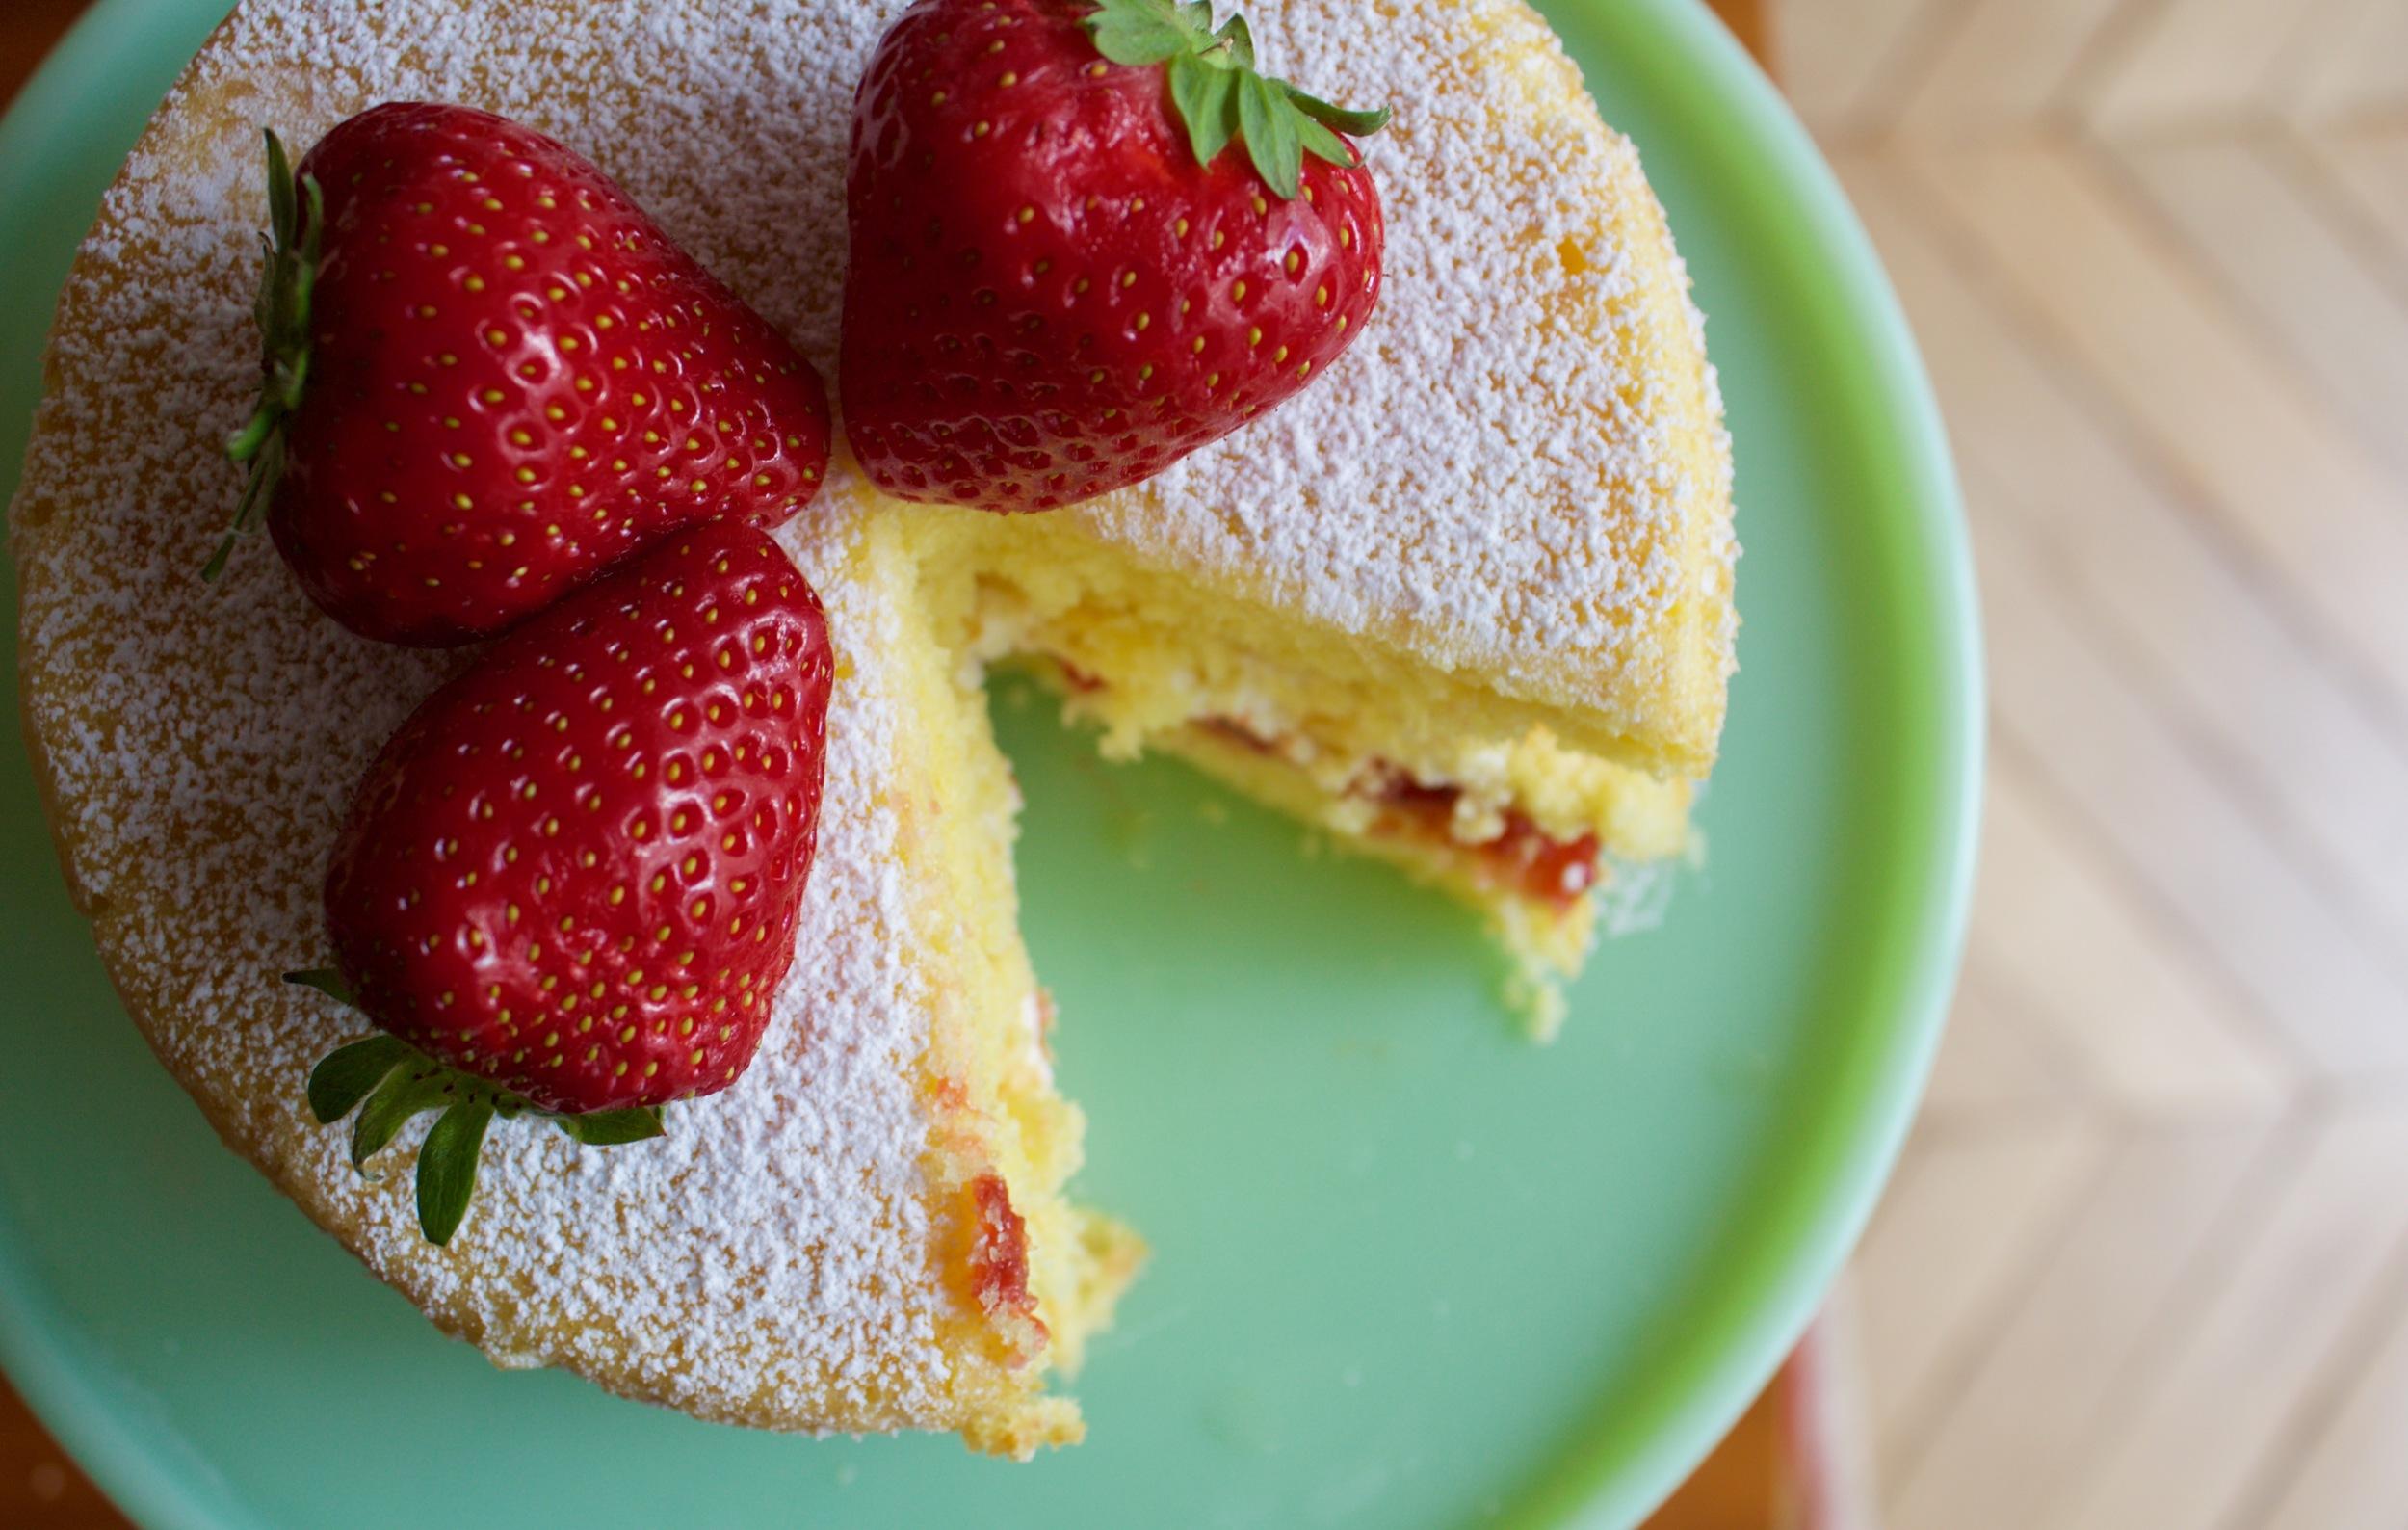 Sponge cake, cream and strawberry jam...